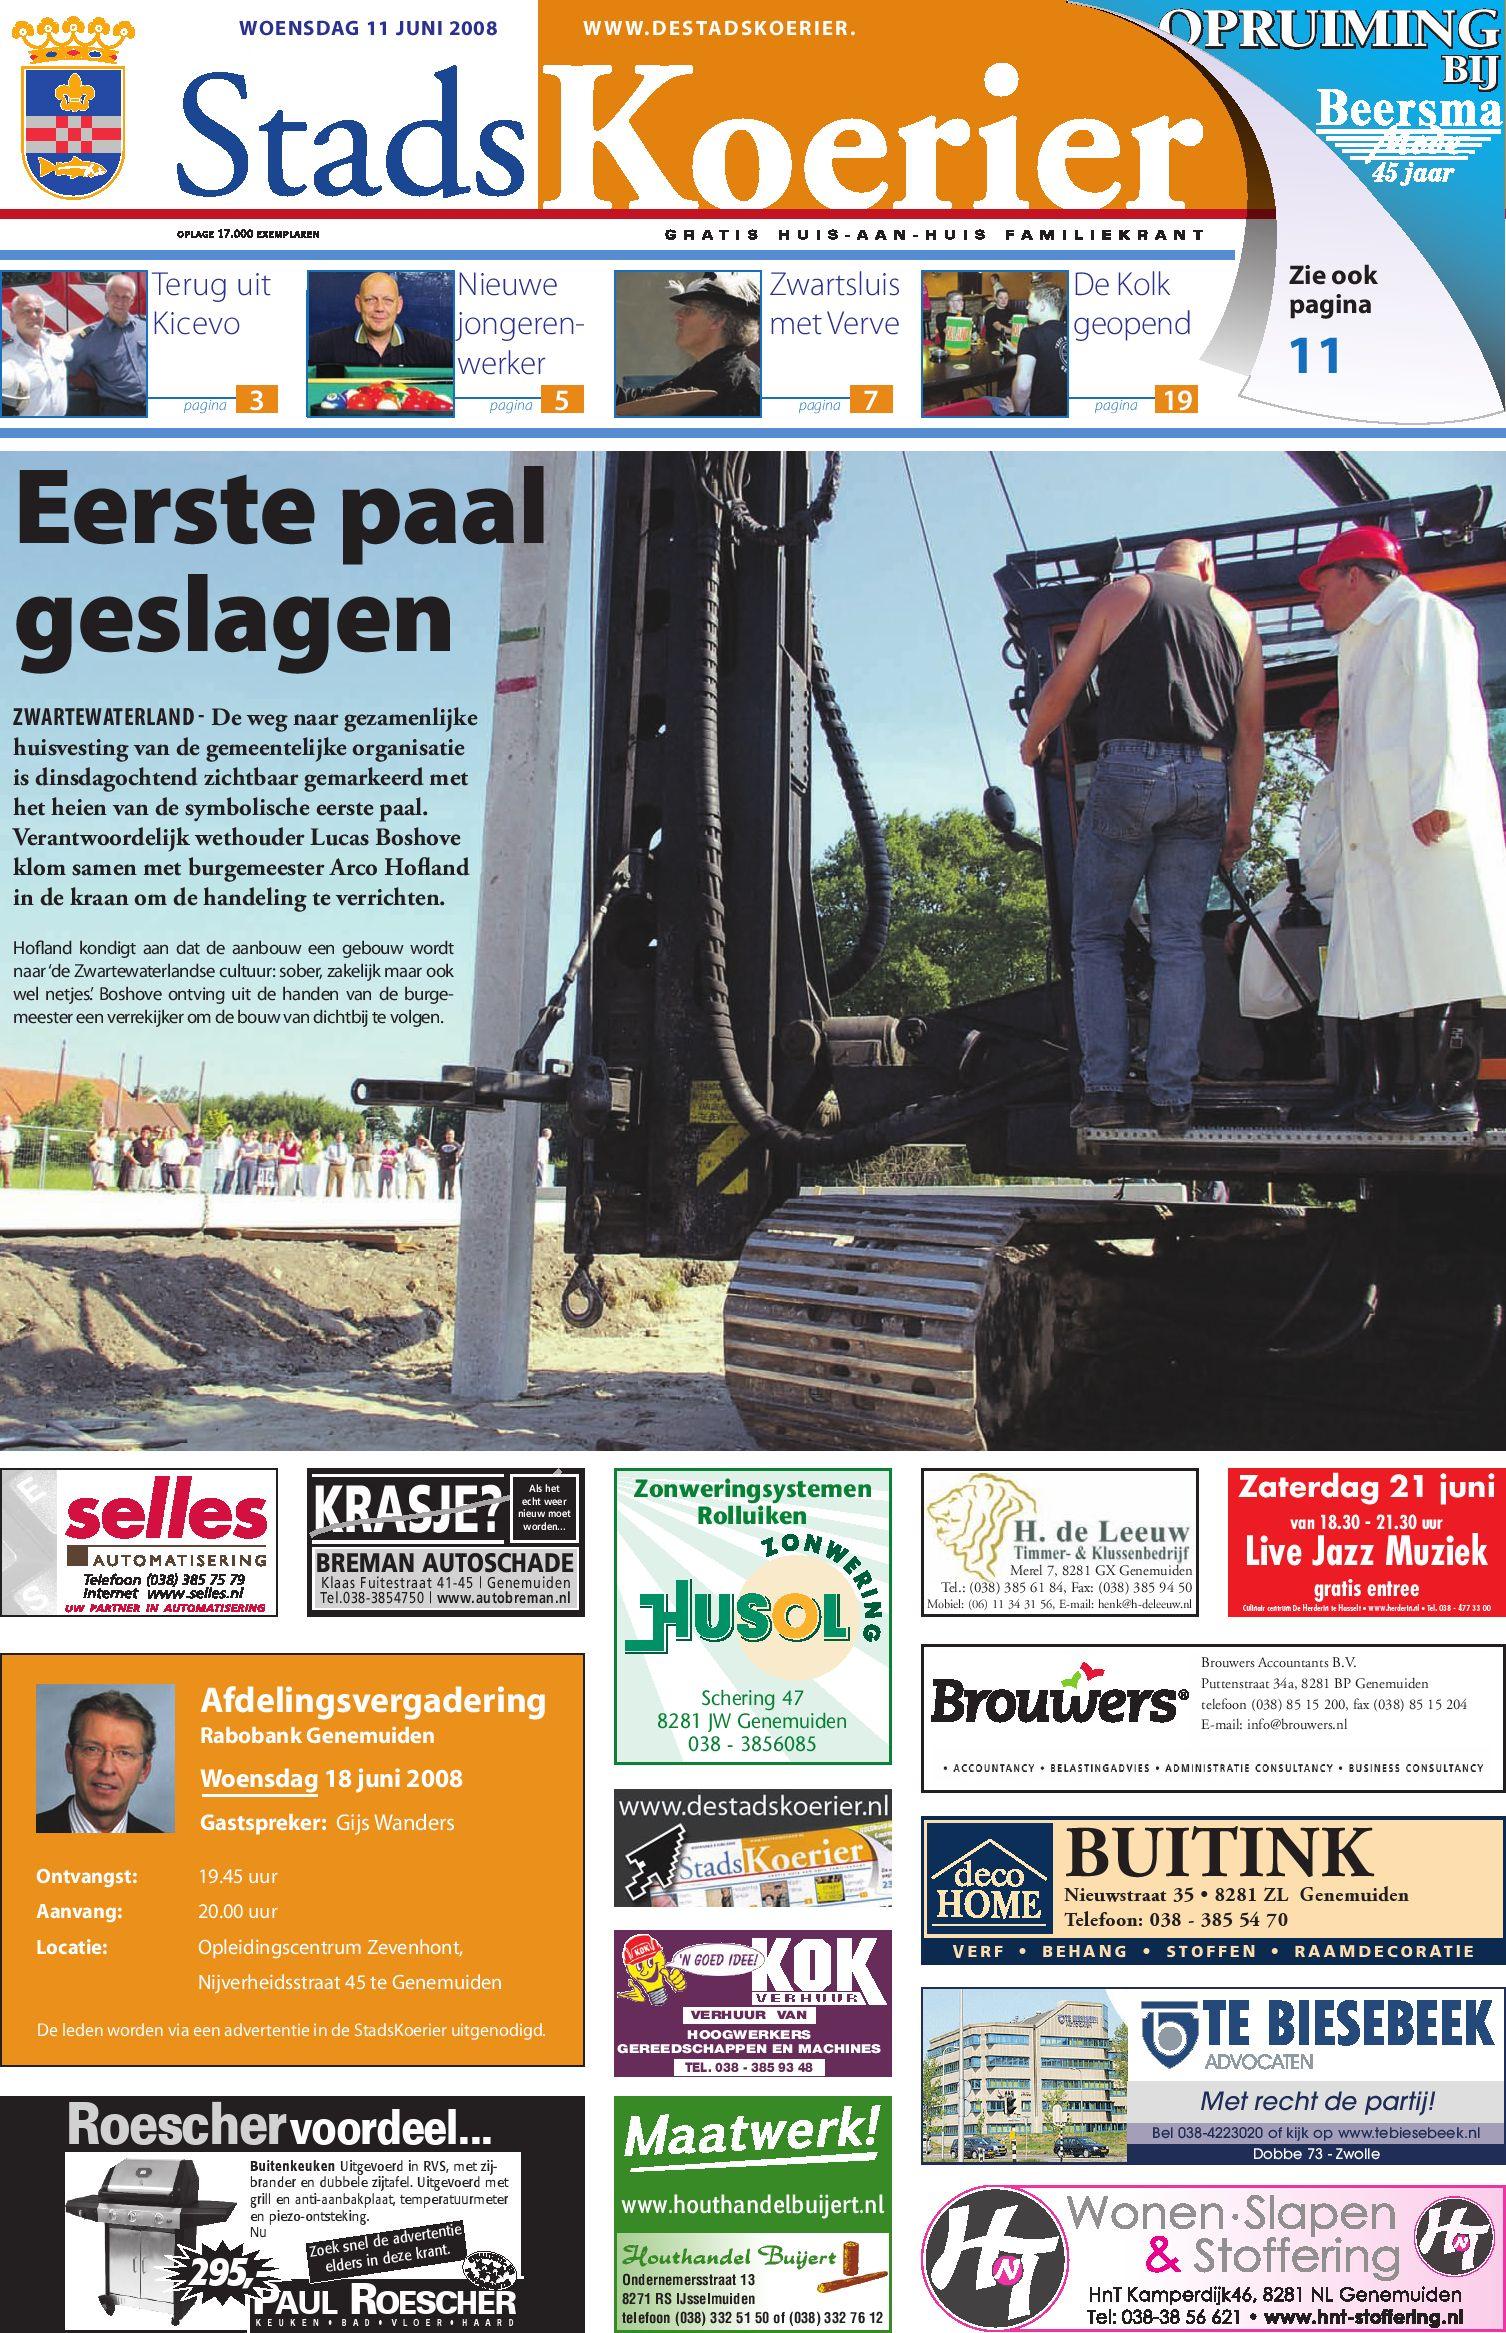 Stadskoerier week 24 by brugmedia b.v.   issuu